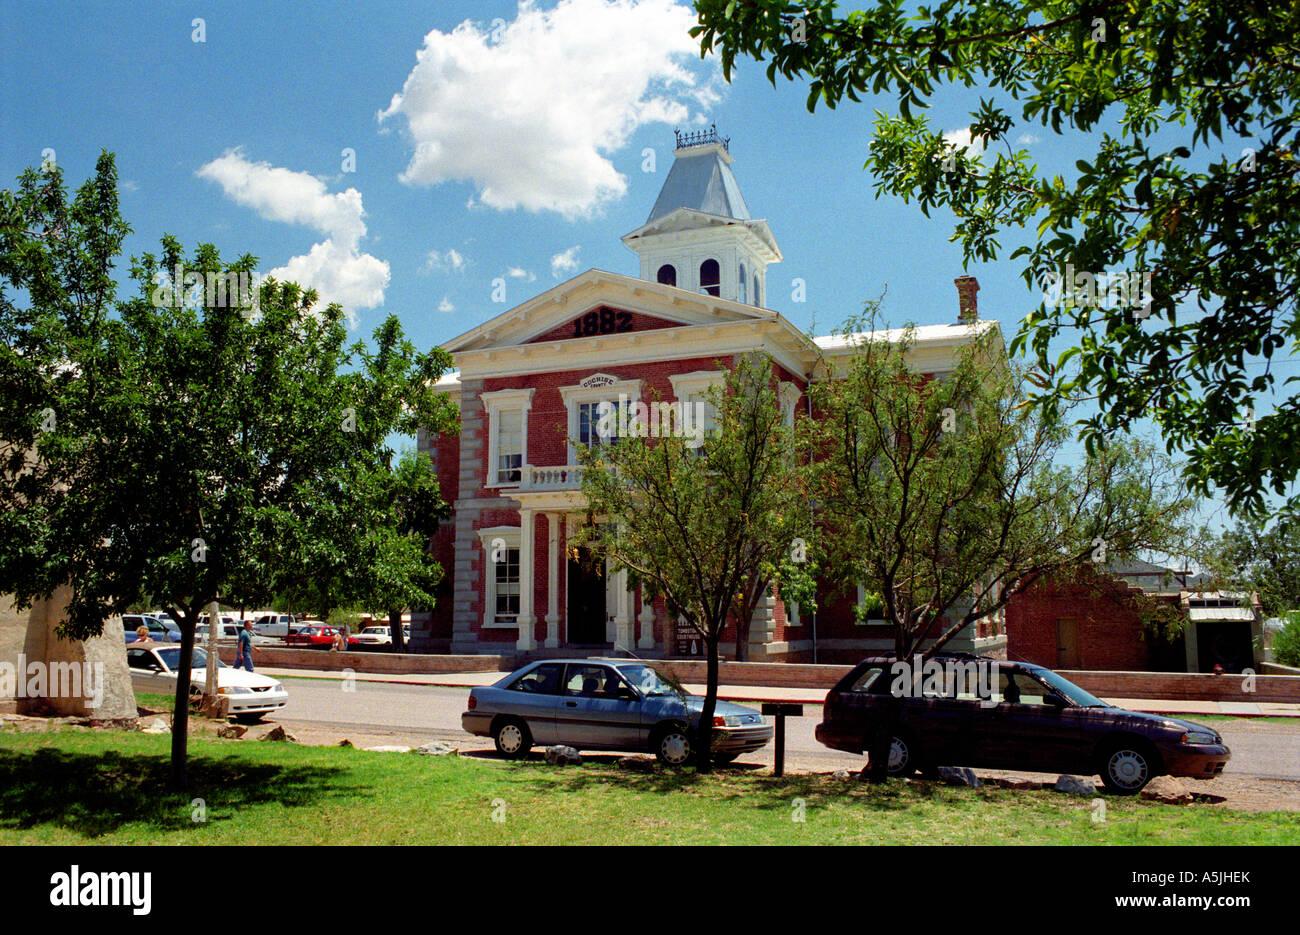 Arizona cochise county cochise - Stock Photo The Cochise County Courthouse Tombstone Arizona Usa